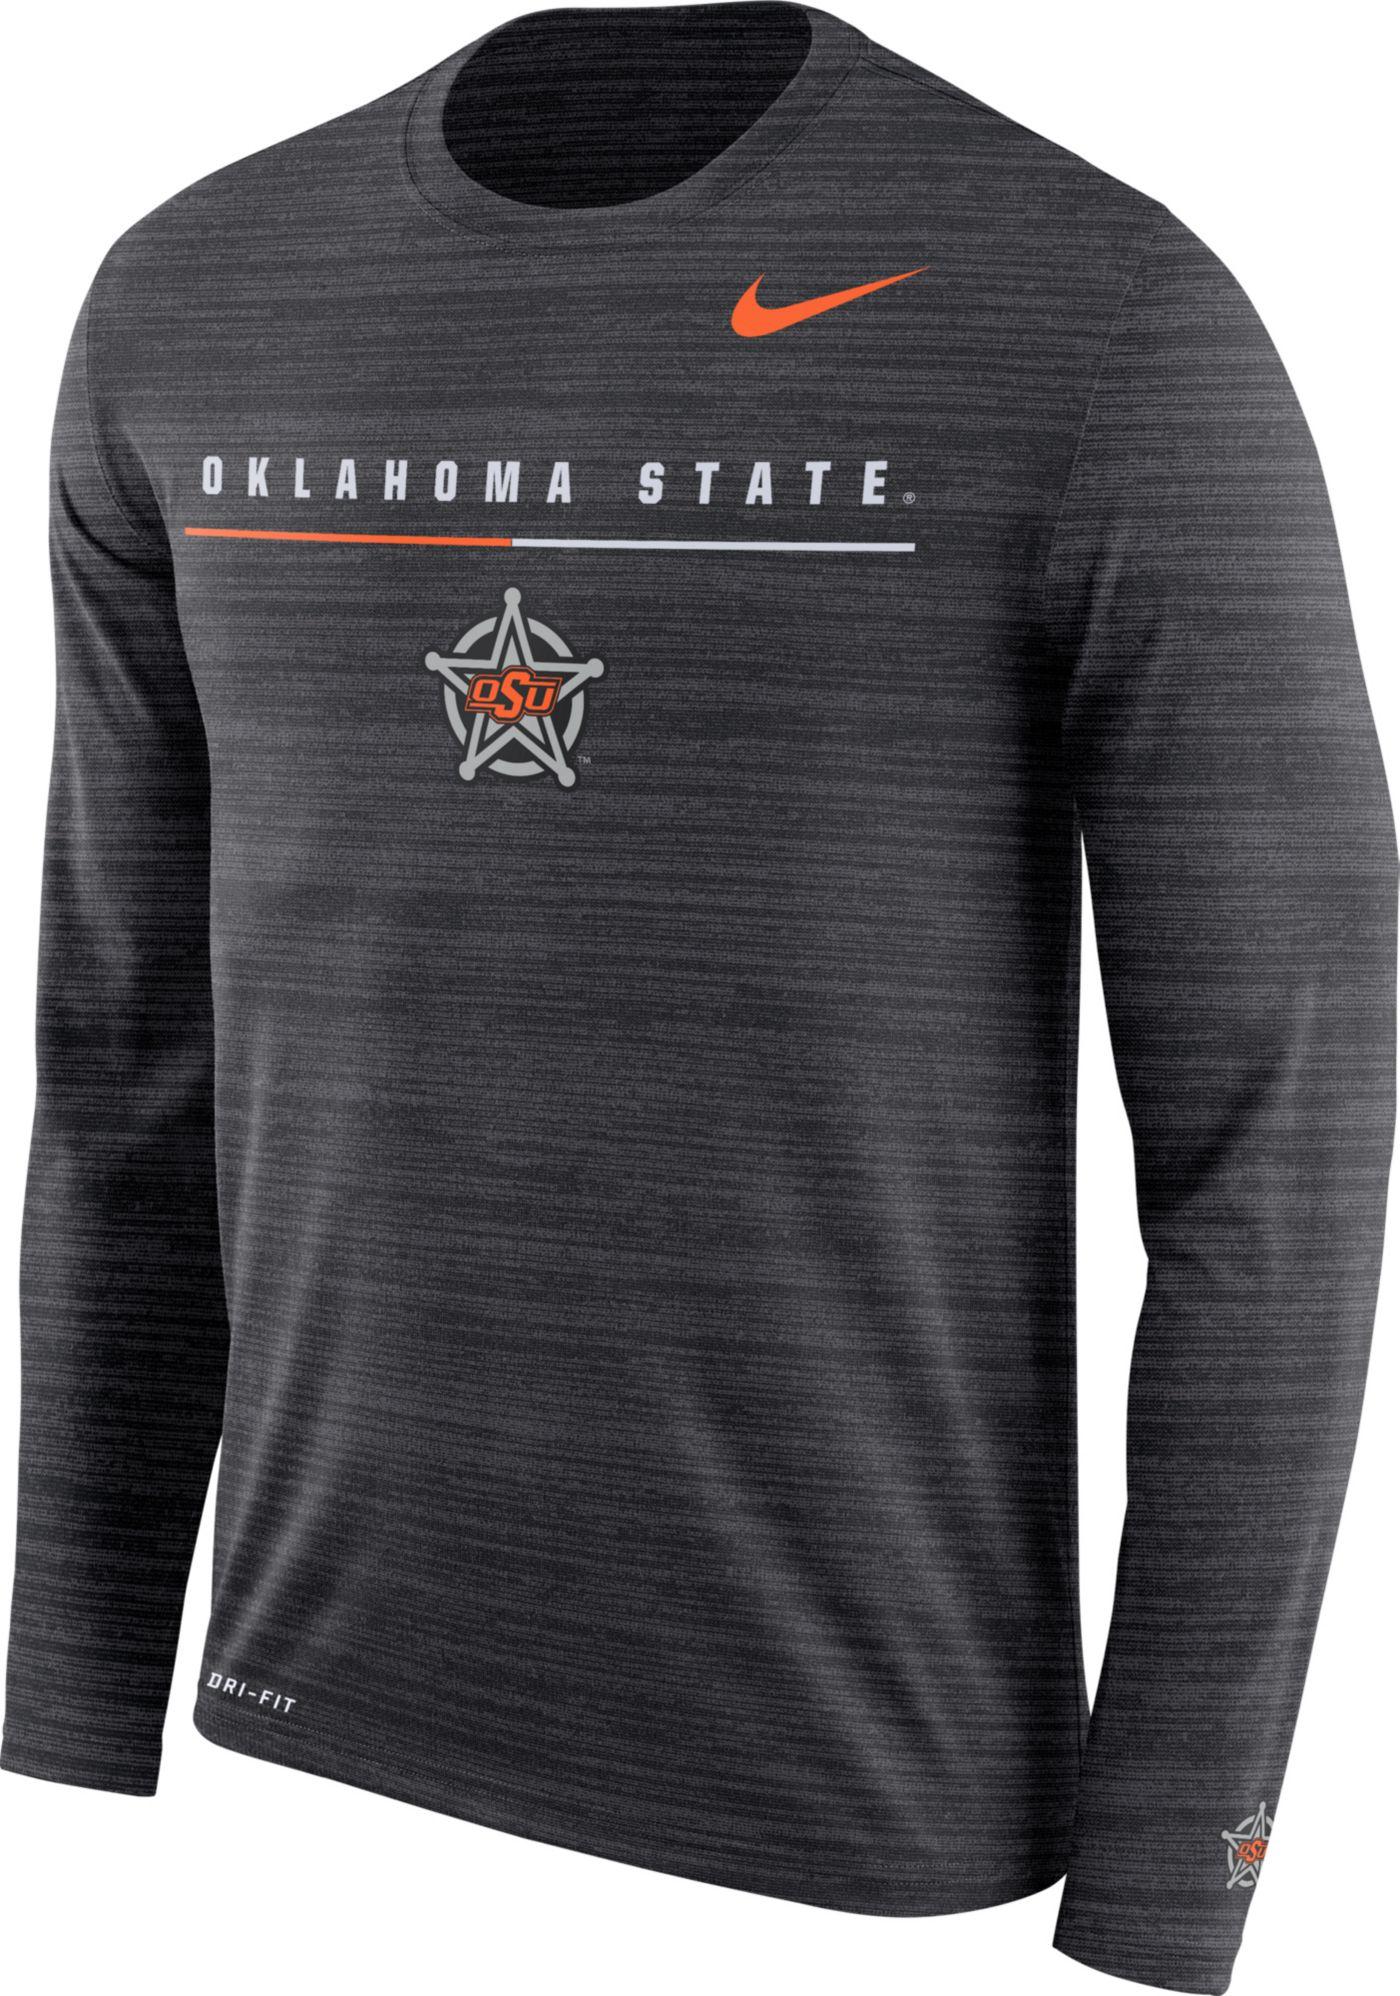 Nike Men's Oklahoma State Cowboys Velocity Legend Graphic Long Sleeve Black T-Shirt